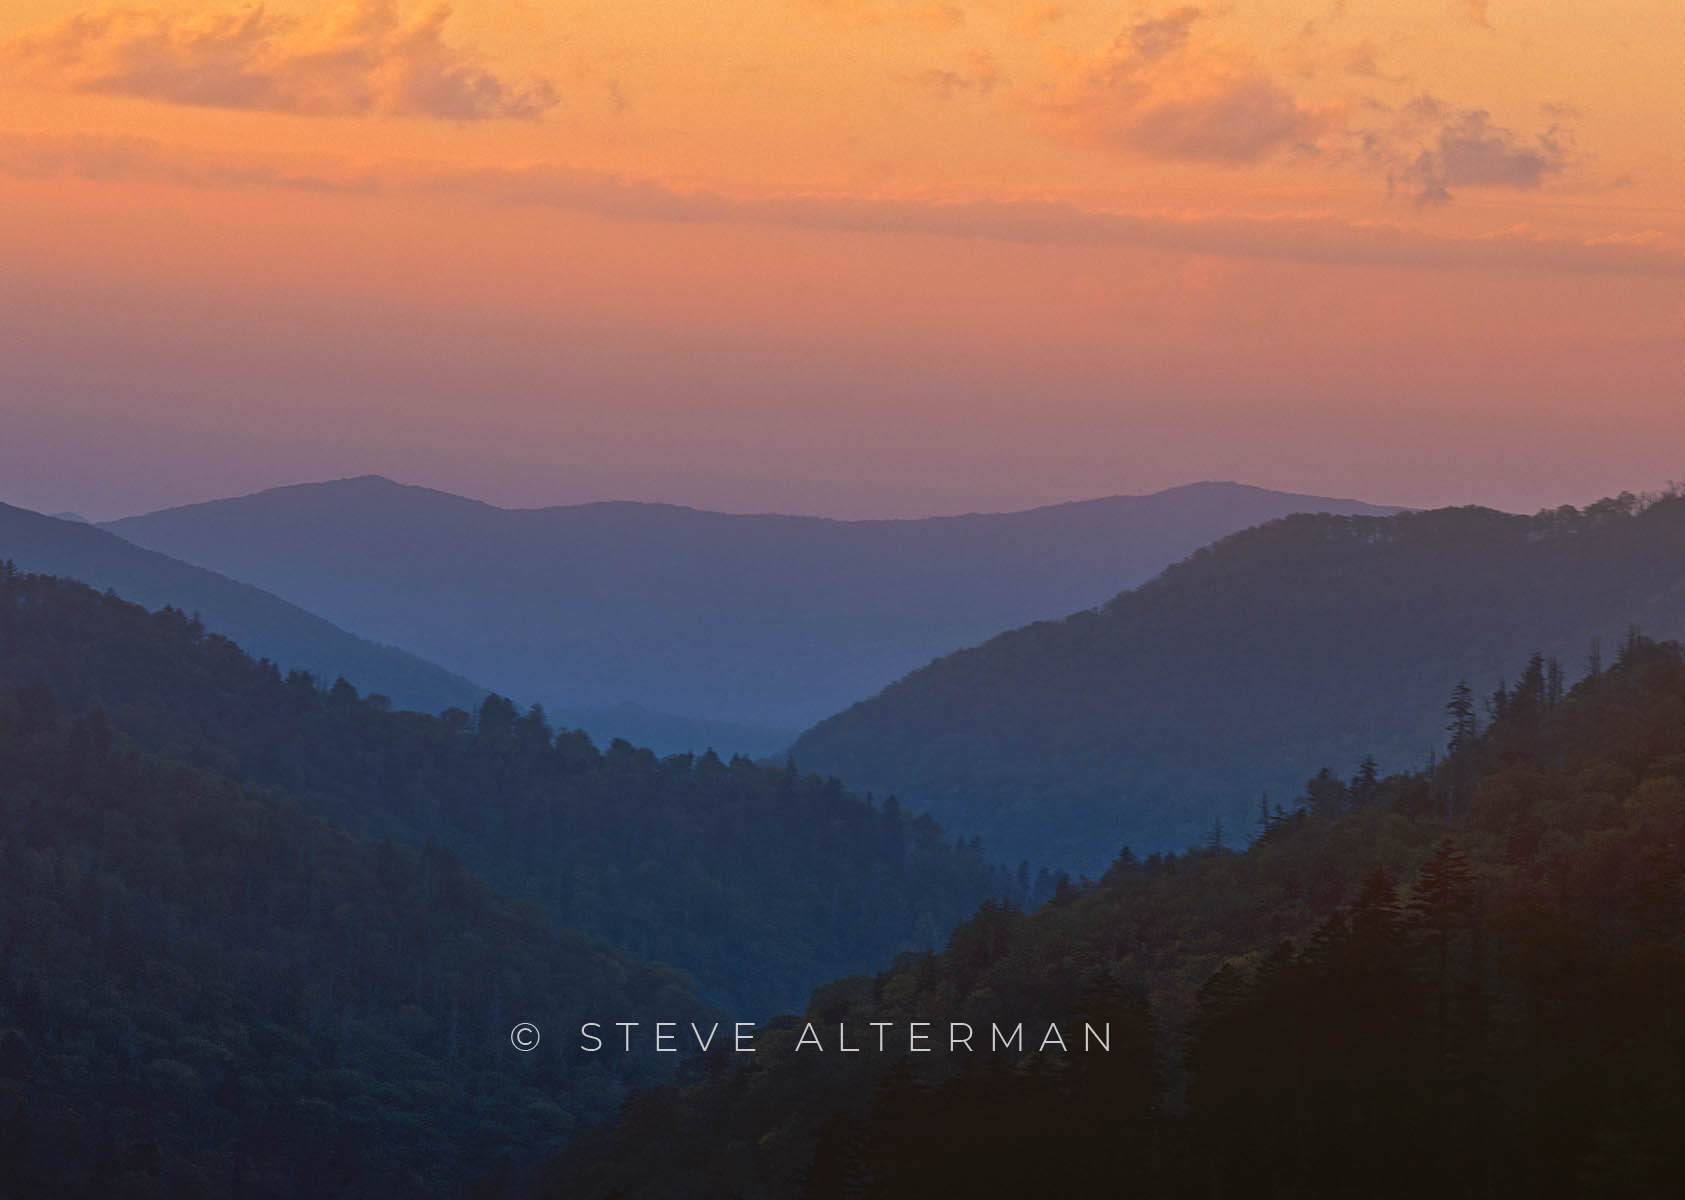 832 Dusk at Moton's Overlook - Great Smoky Mountains NP